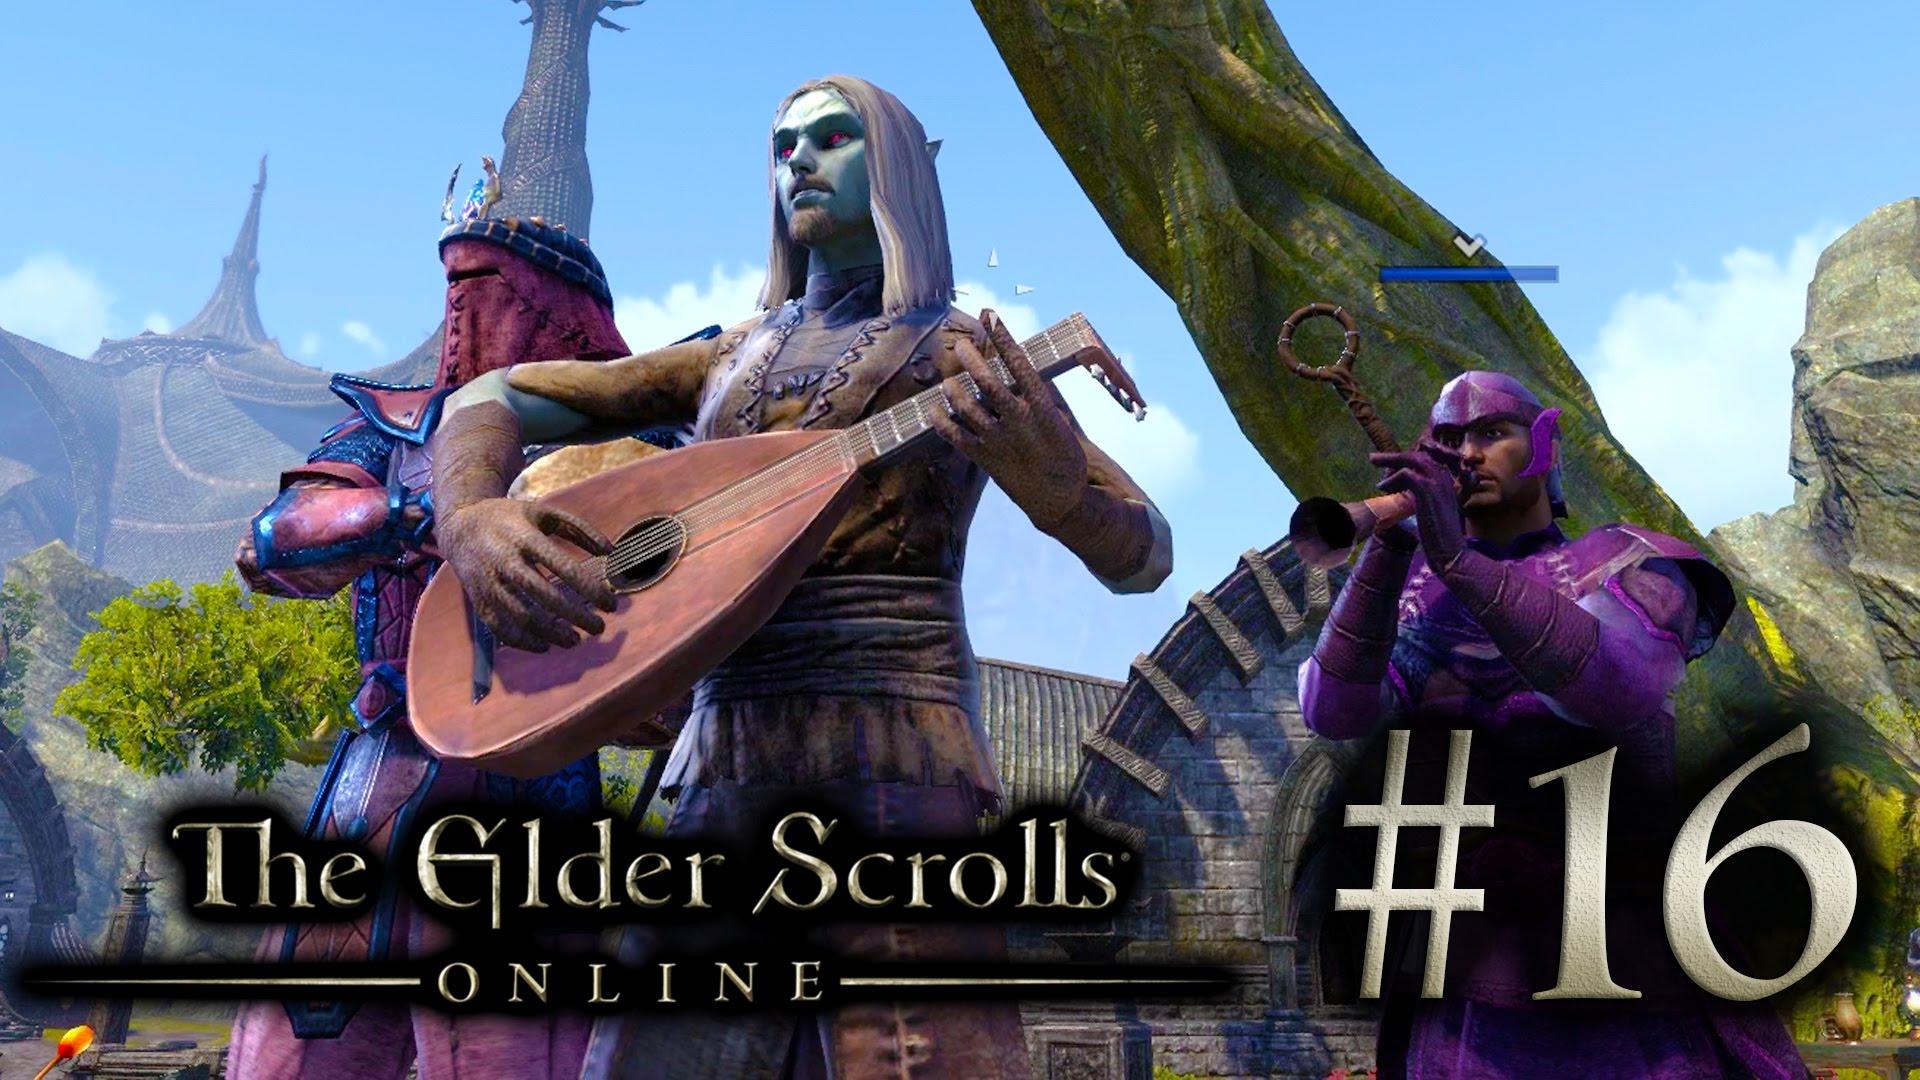 #16 The Elder Scrolls Online [エルダー・スクロールズ・オンライン]